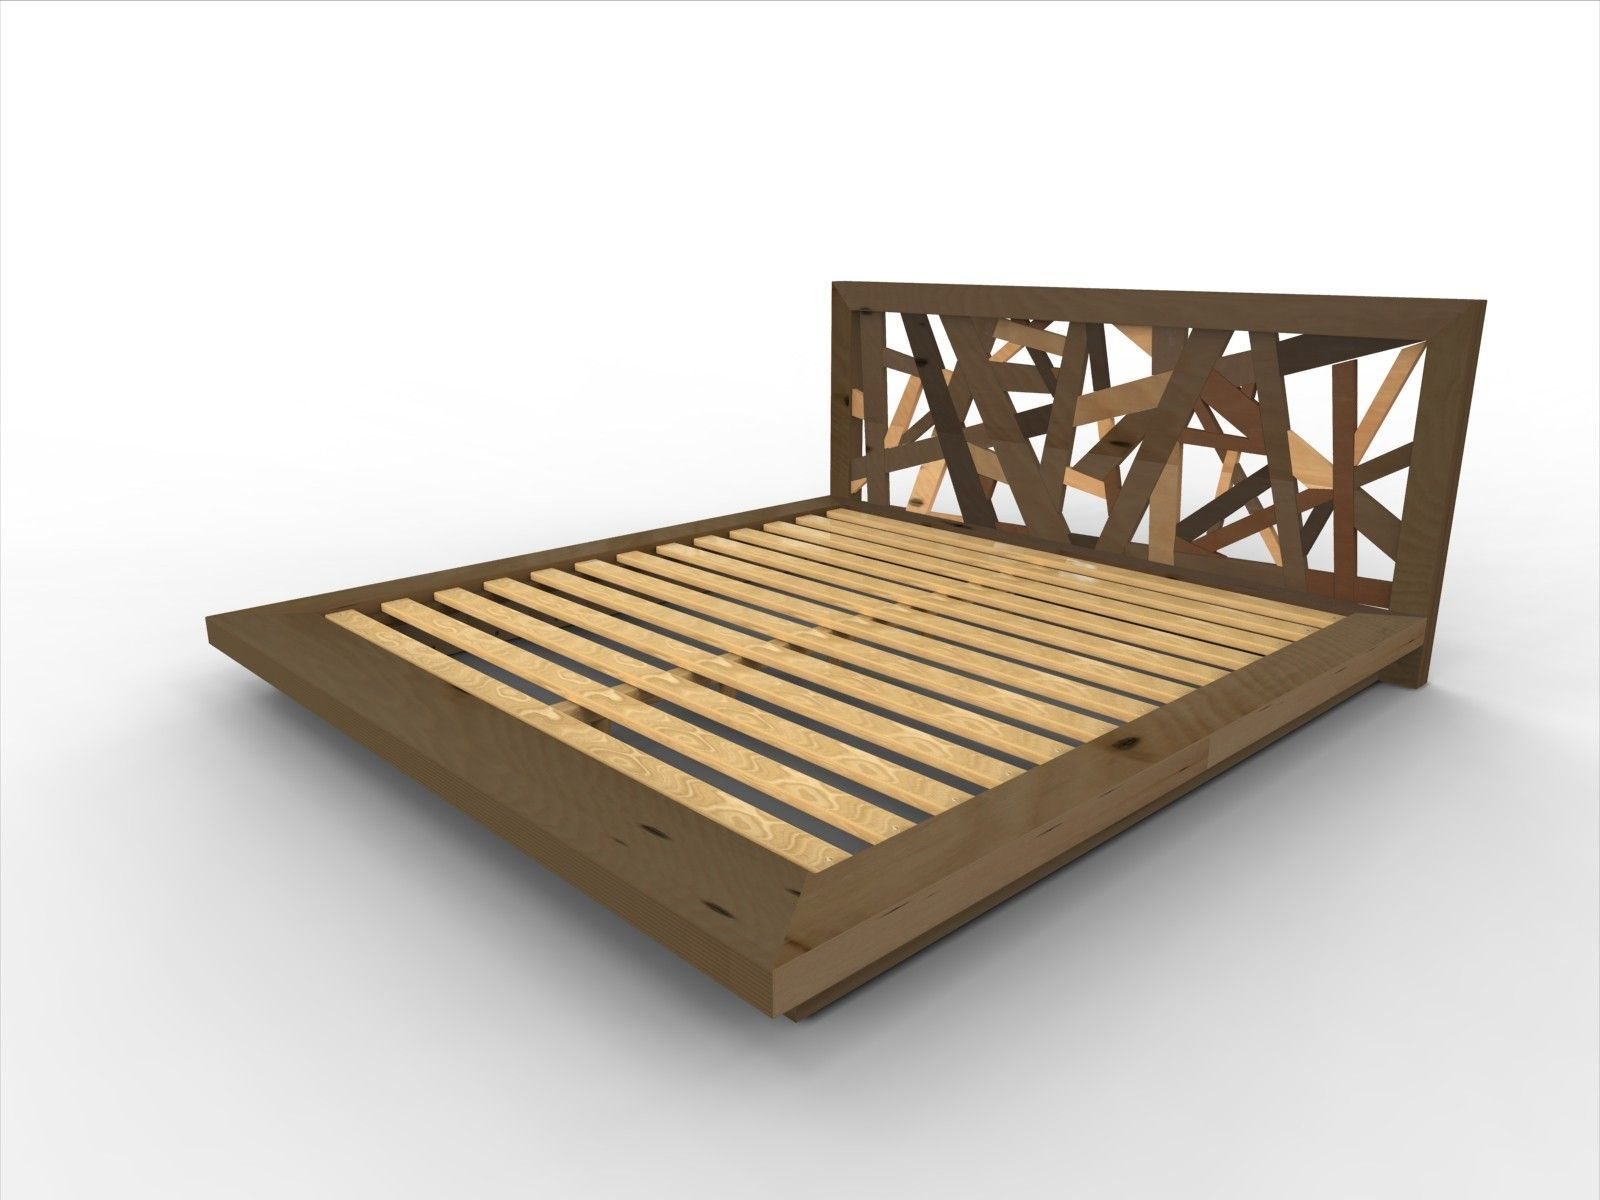 Full Size Platform Bed Plans Free Bed frame and